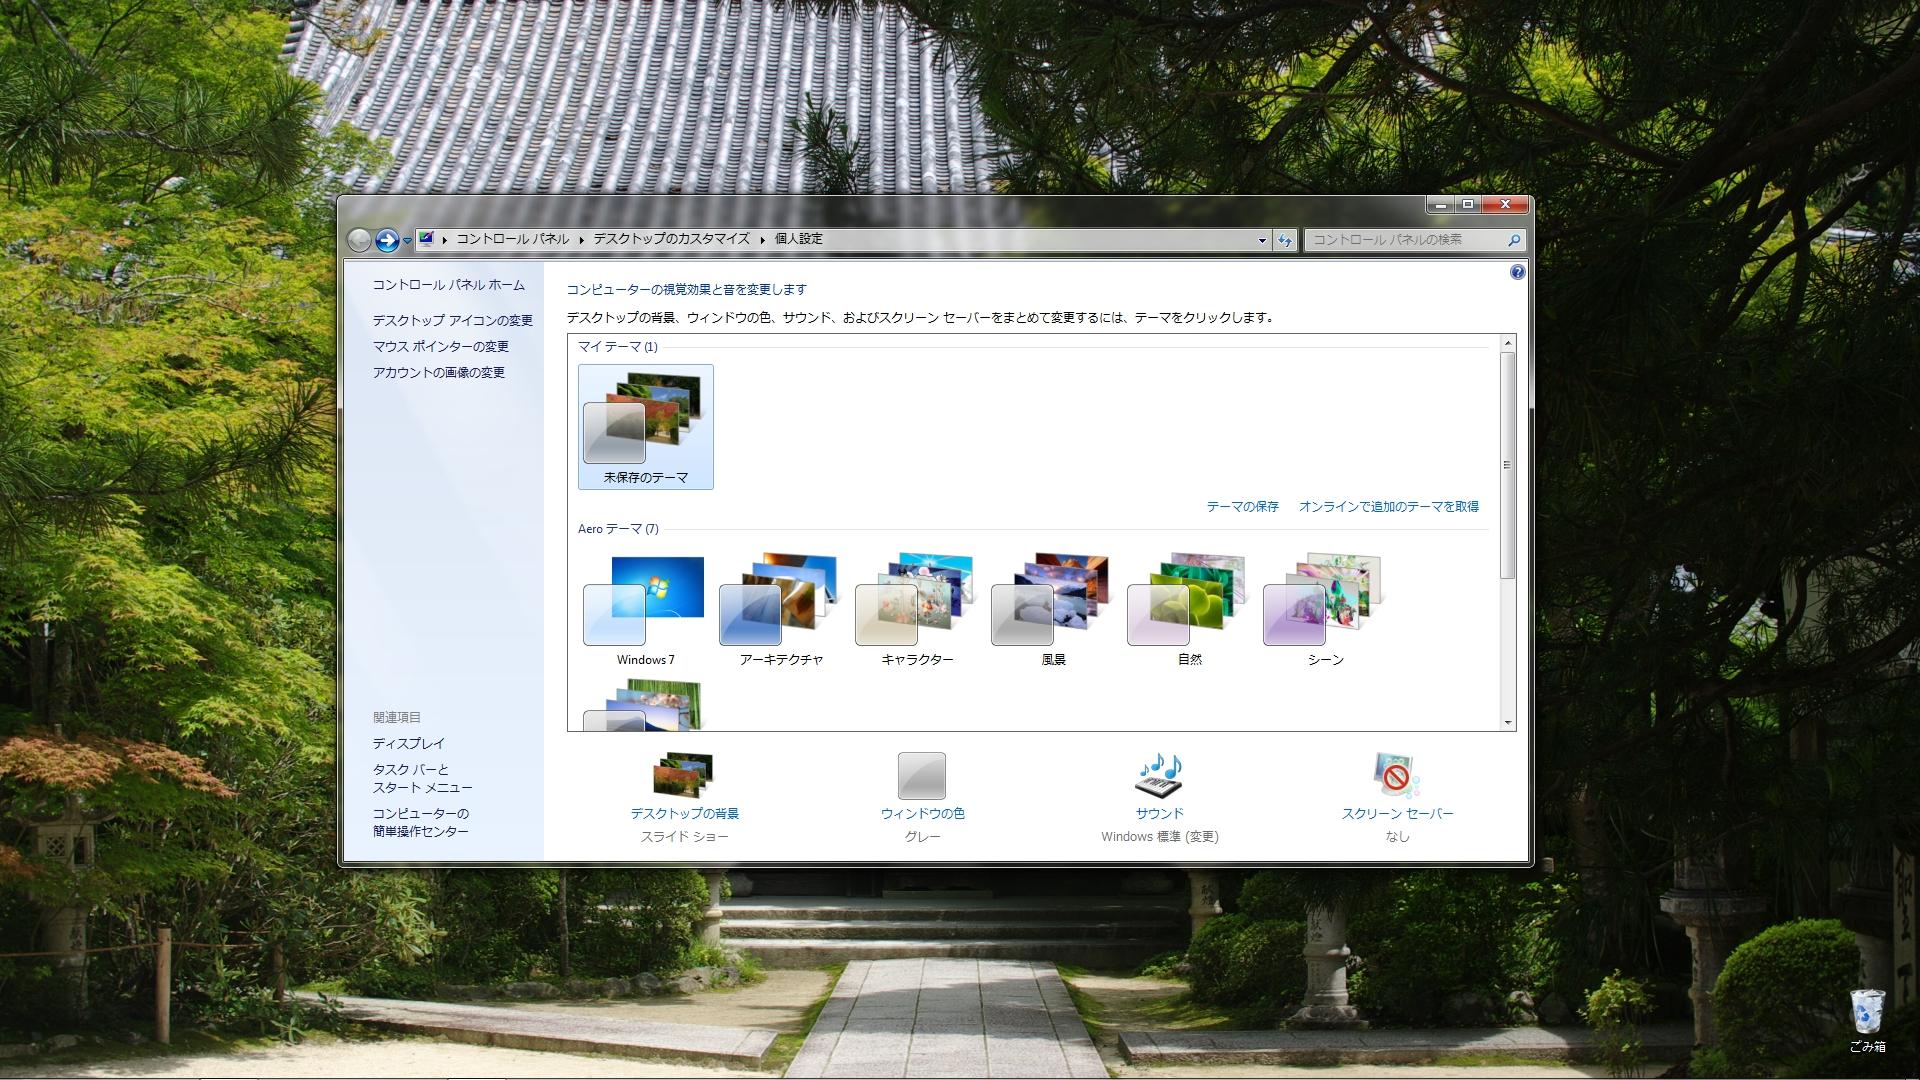 Http Www Yaotomi Co Jp Blog Walk E5 A3 81 E7 B4 99 E5 A4 89 E6